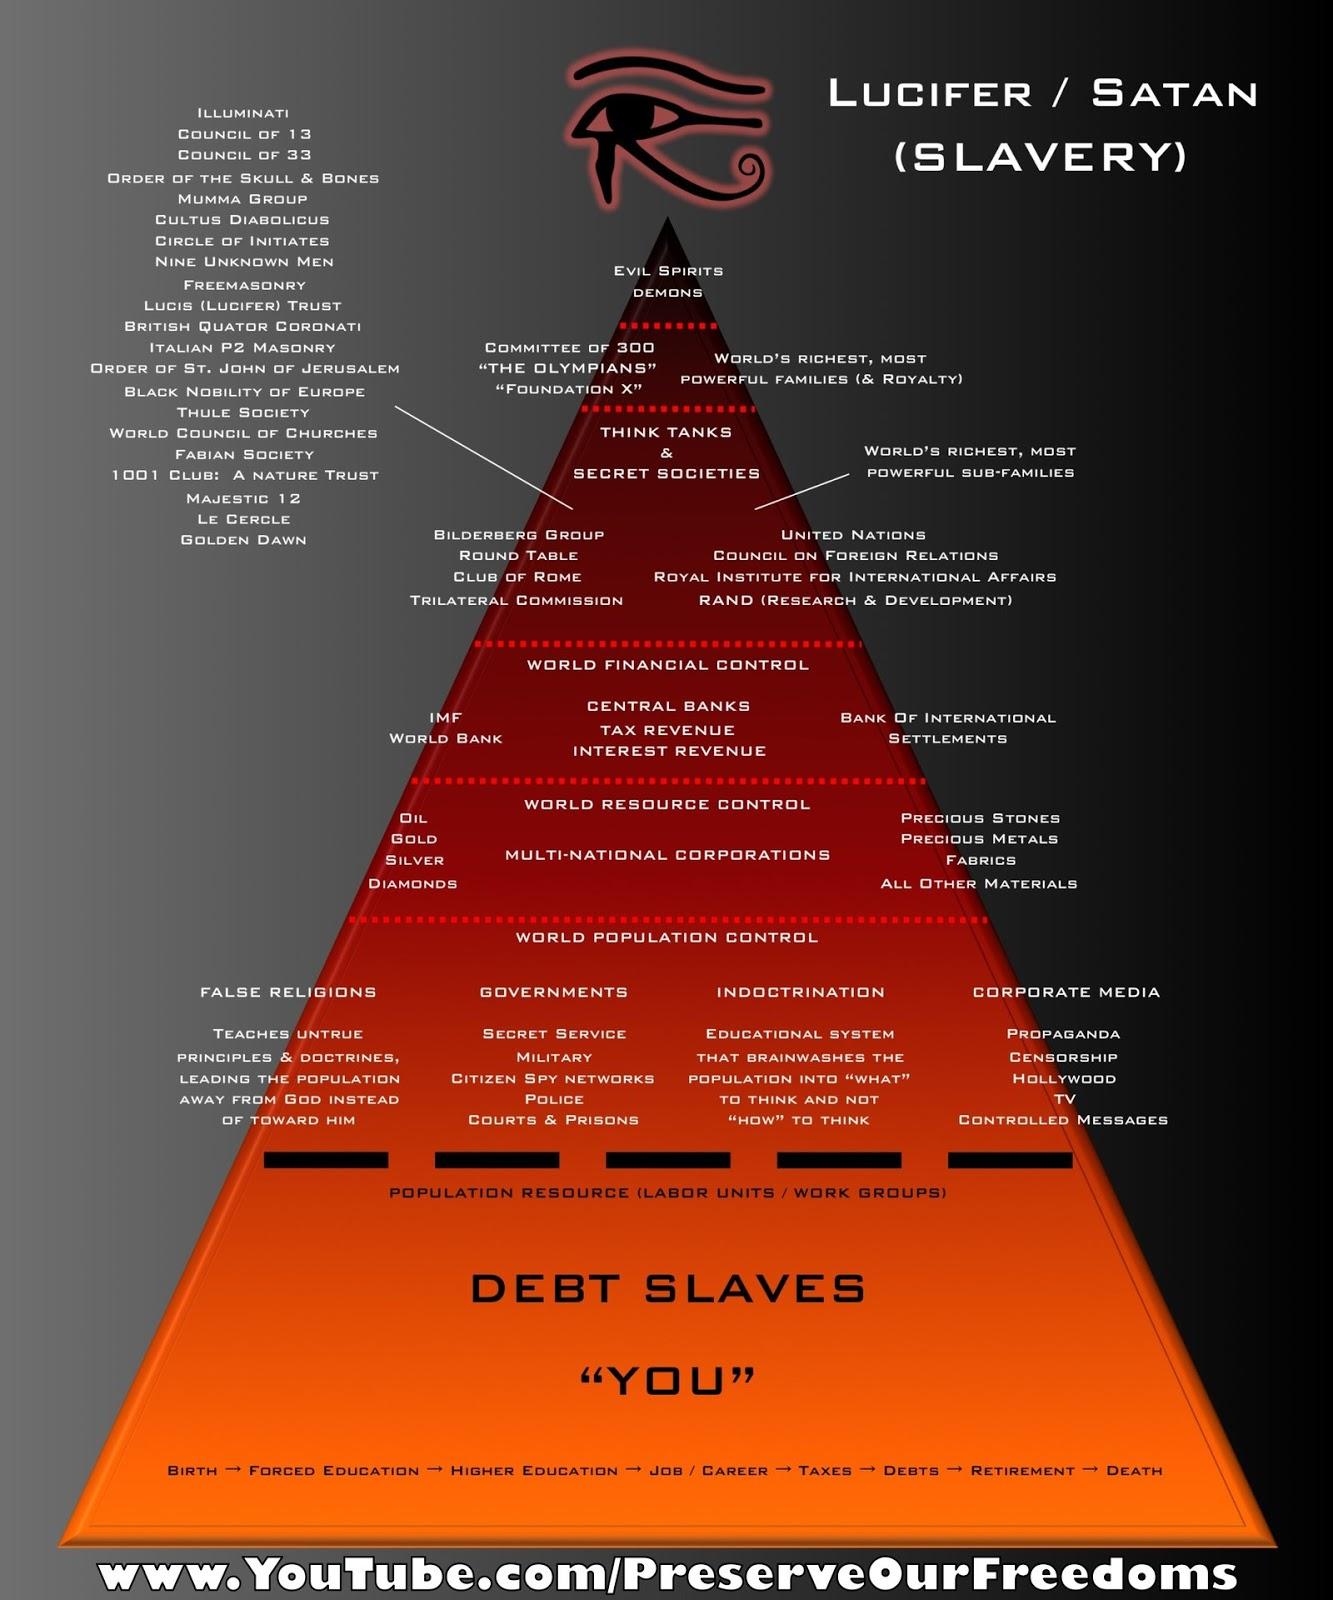 Lucifer S Power Pyramid By Nixseraph On Deviantart: Gizli Dunya Sistemi-Deccalin